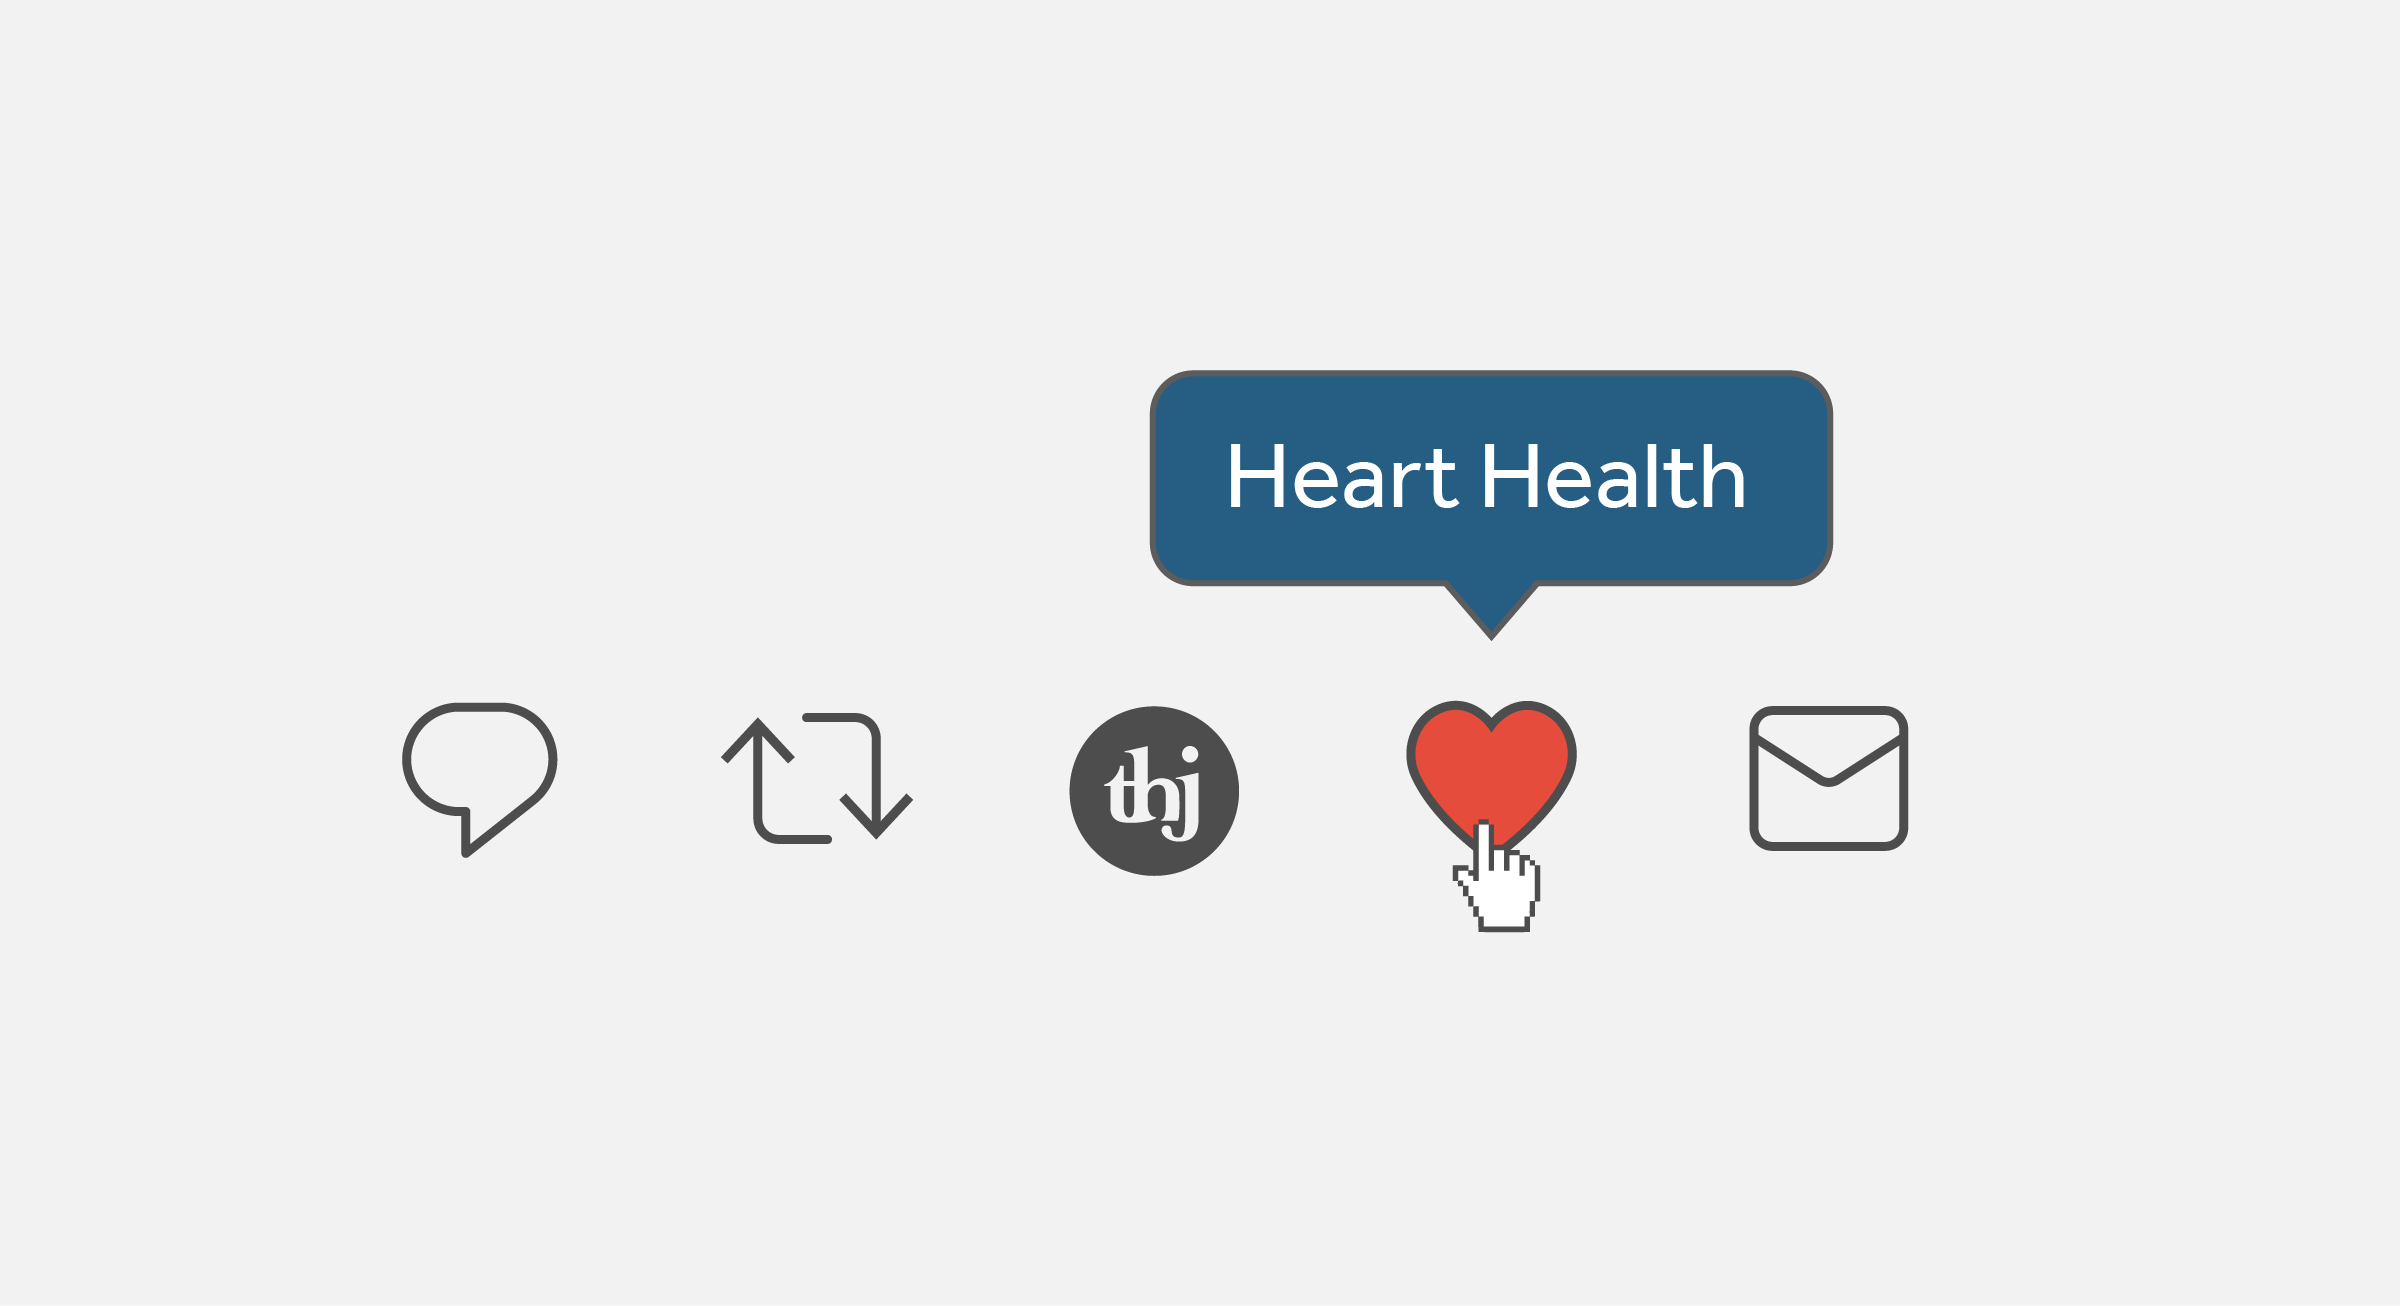 Heart Health - August 2018